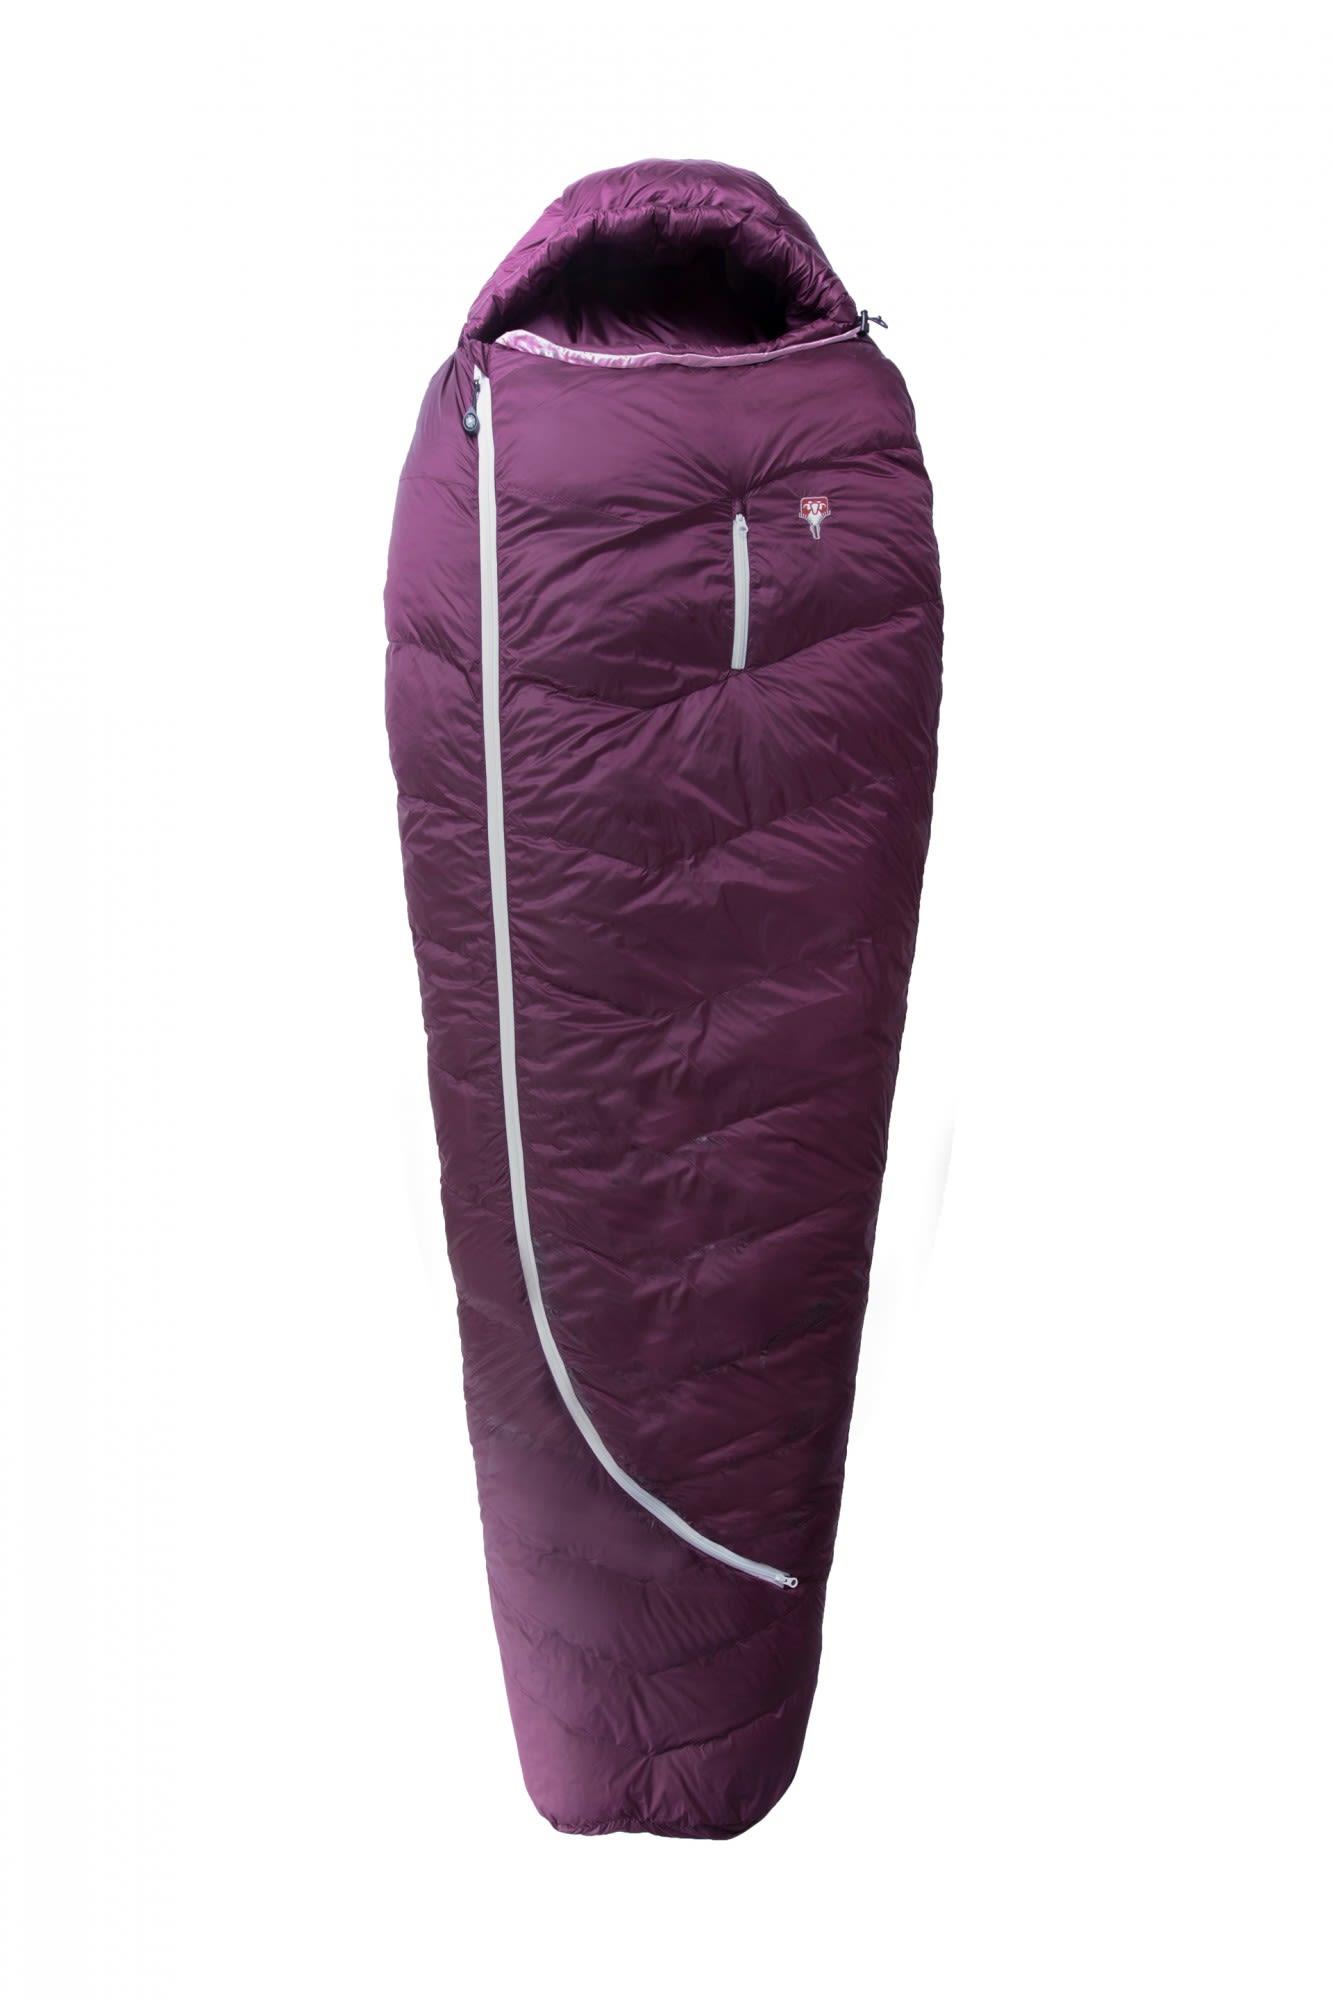 Grüezi Bag Biopod Downwool Subzero 175 Lila/Violett, Female Daunen Daunenschlaf